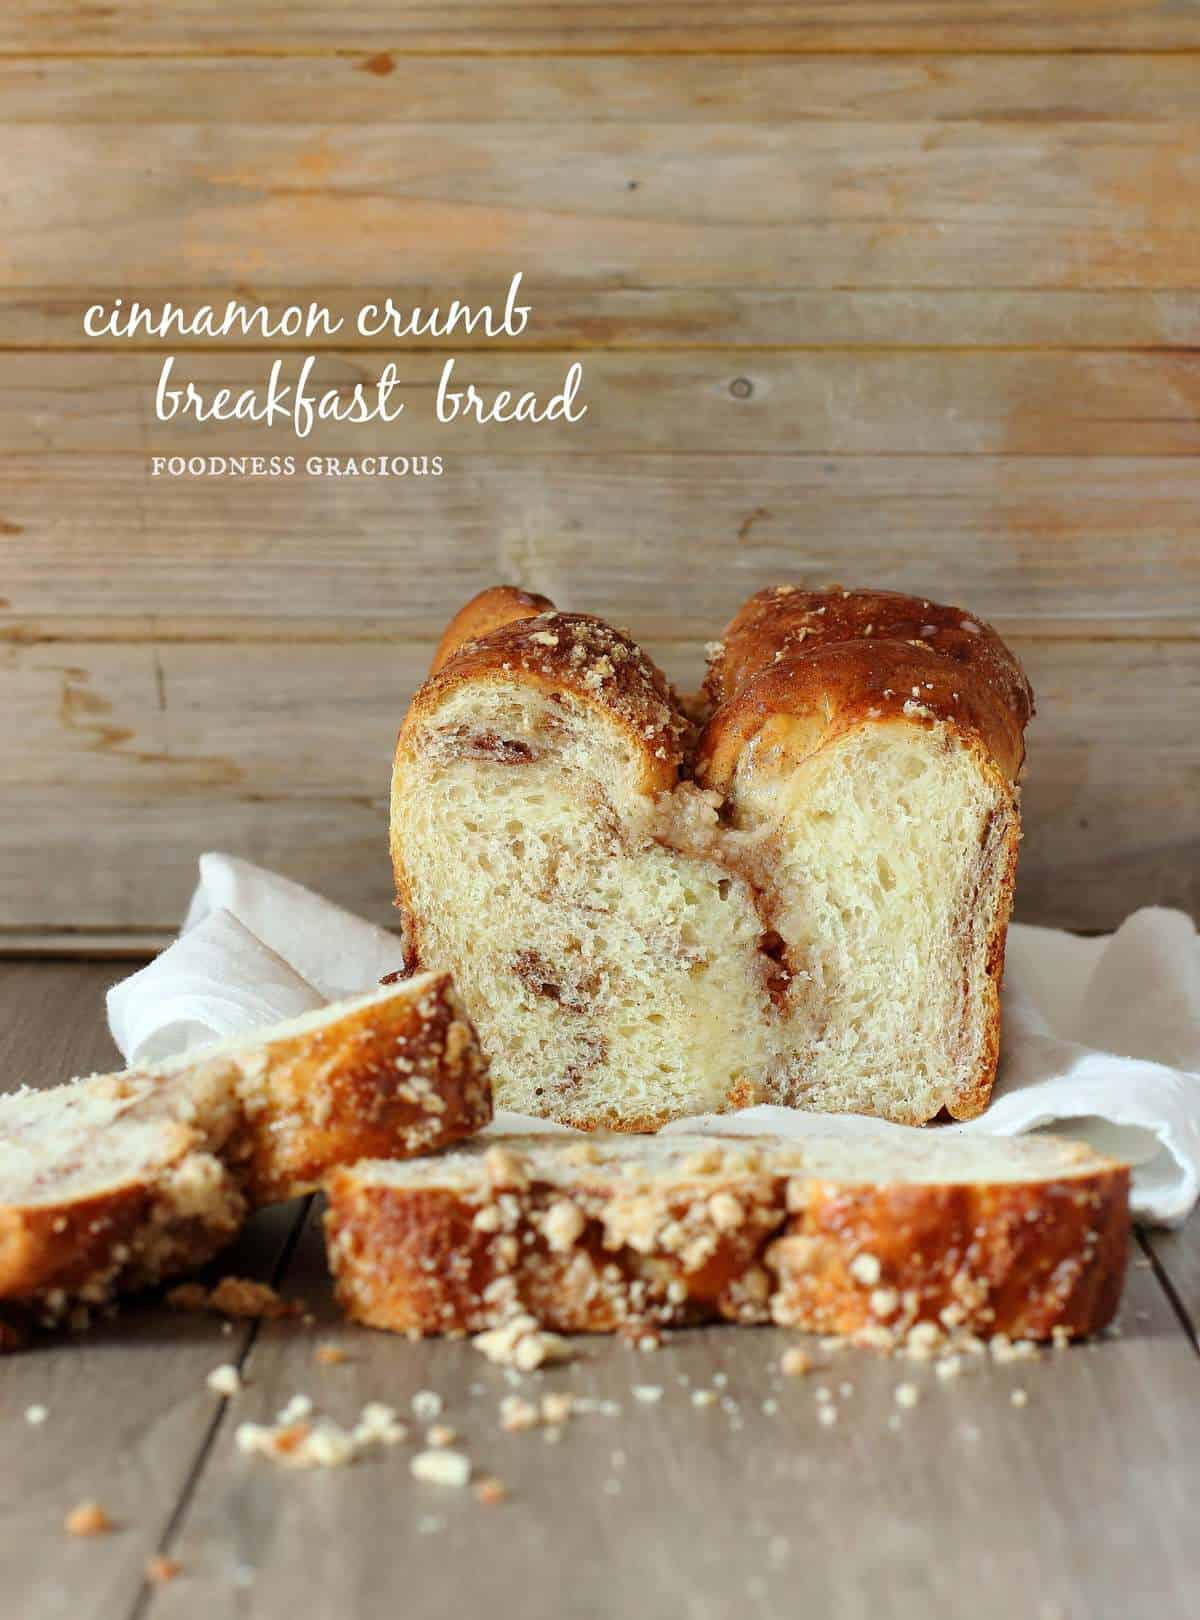 Cinnamon Crumb Breakfast Bread